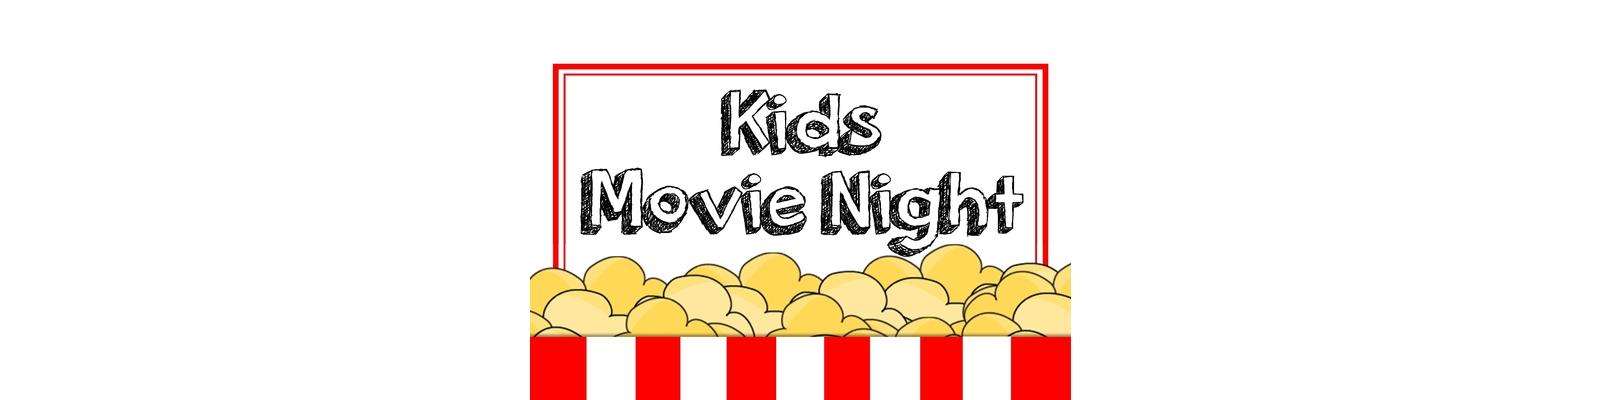 http://www.lakeshorecountryclub.com/uploads/slides/878461_kids-movie-night-pic.jpg